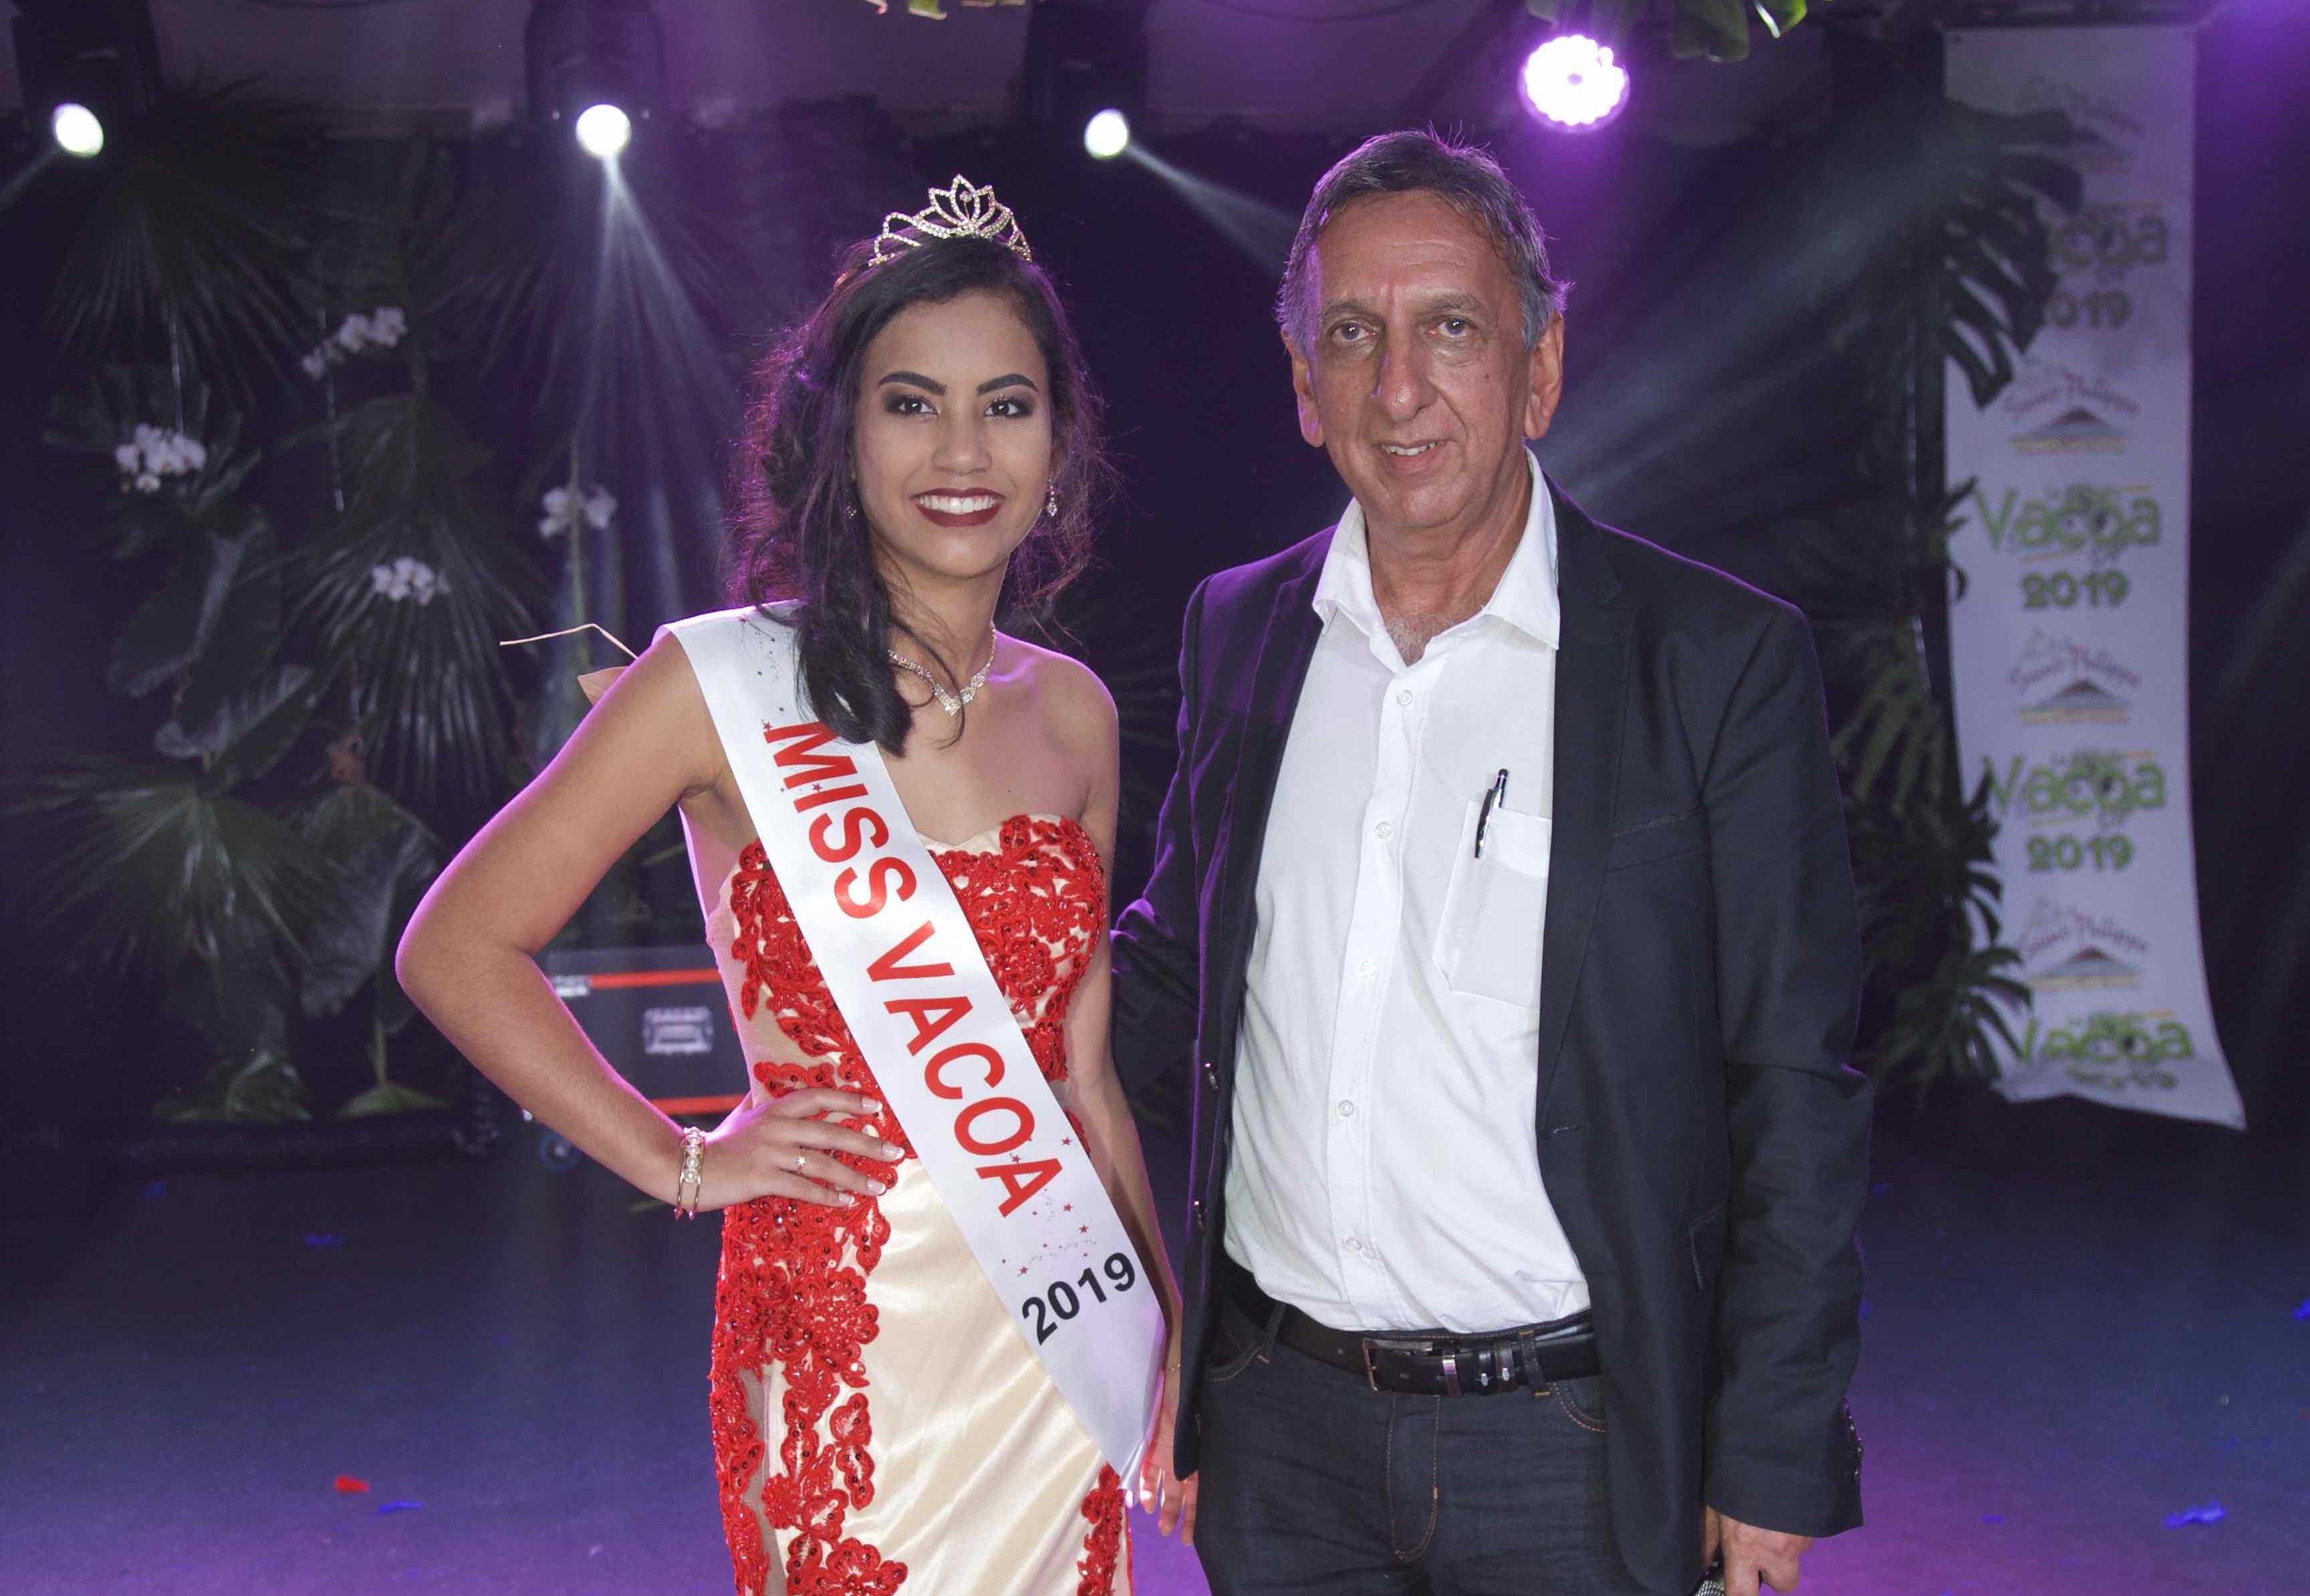 Miss Vacoa et Aziz Patel